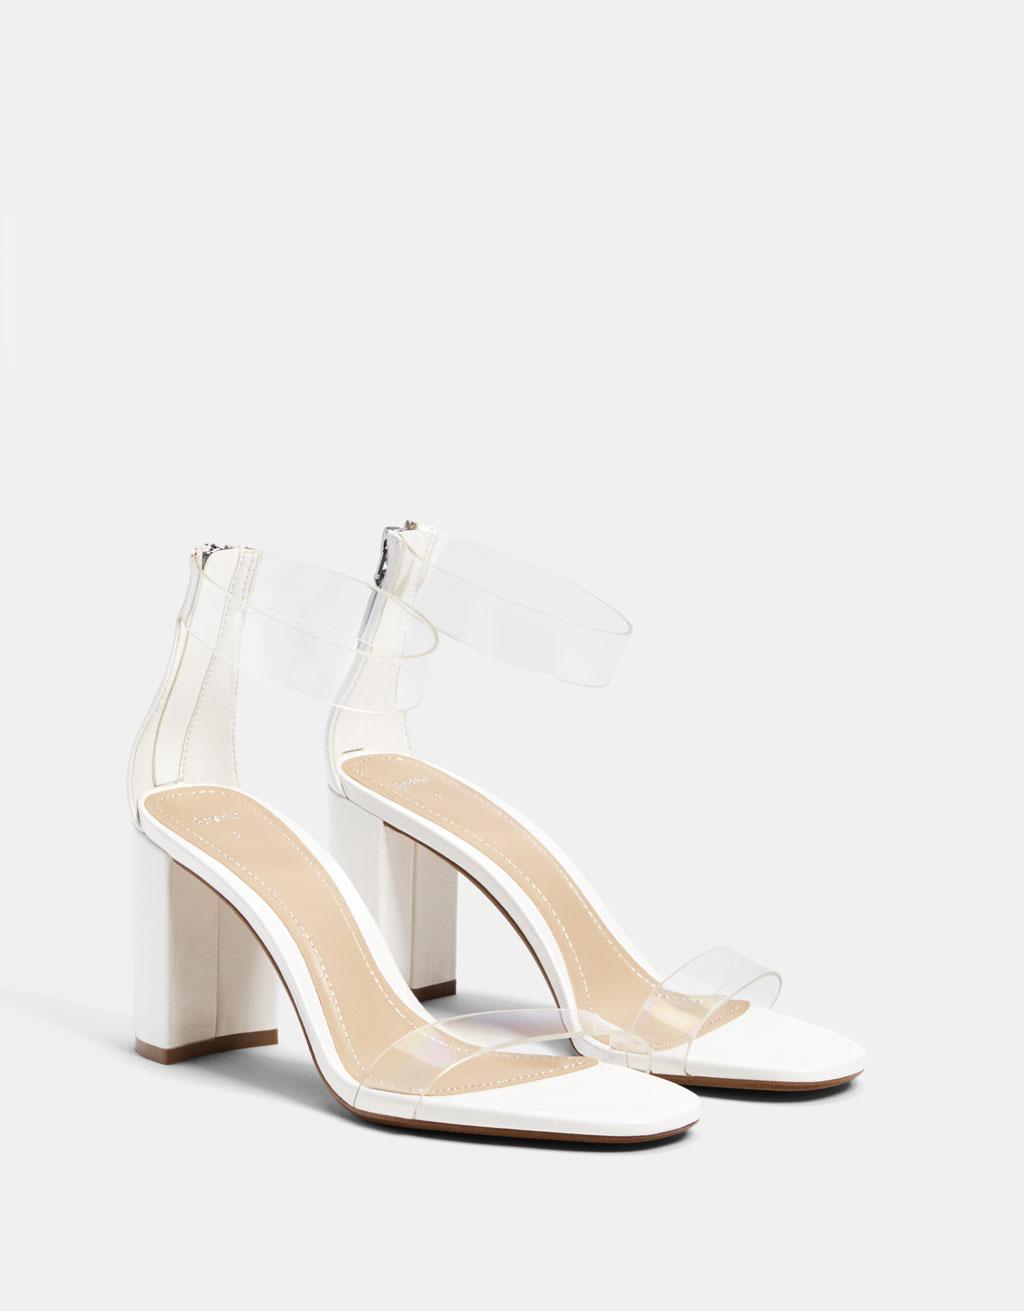 Sandale od vinila s visokom potpeticama.